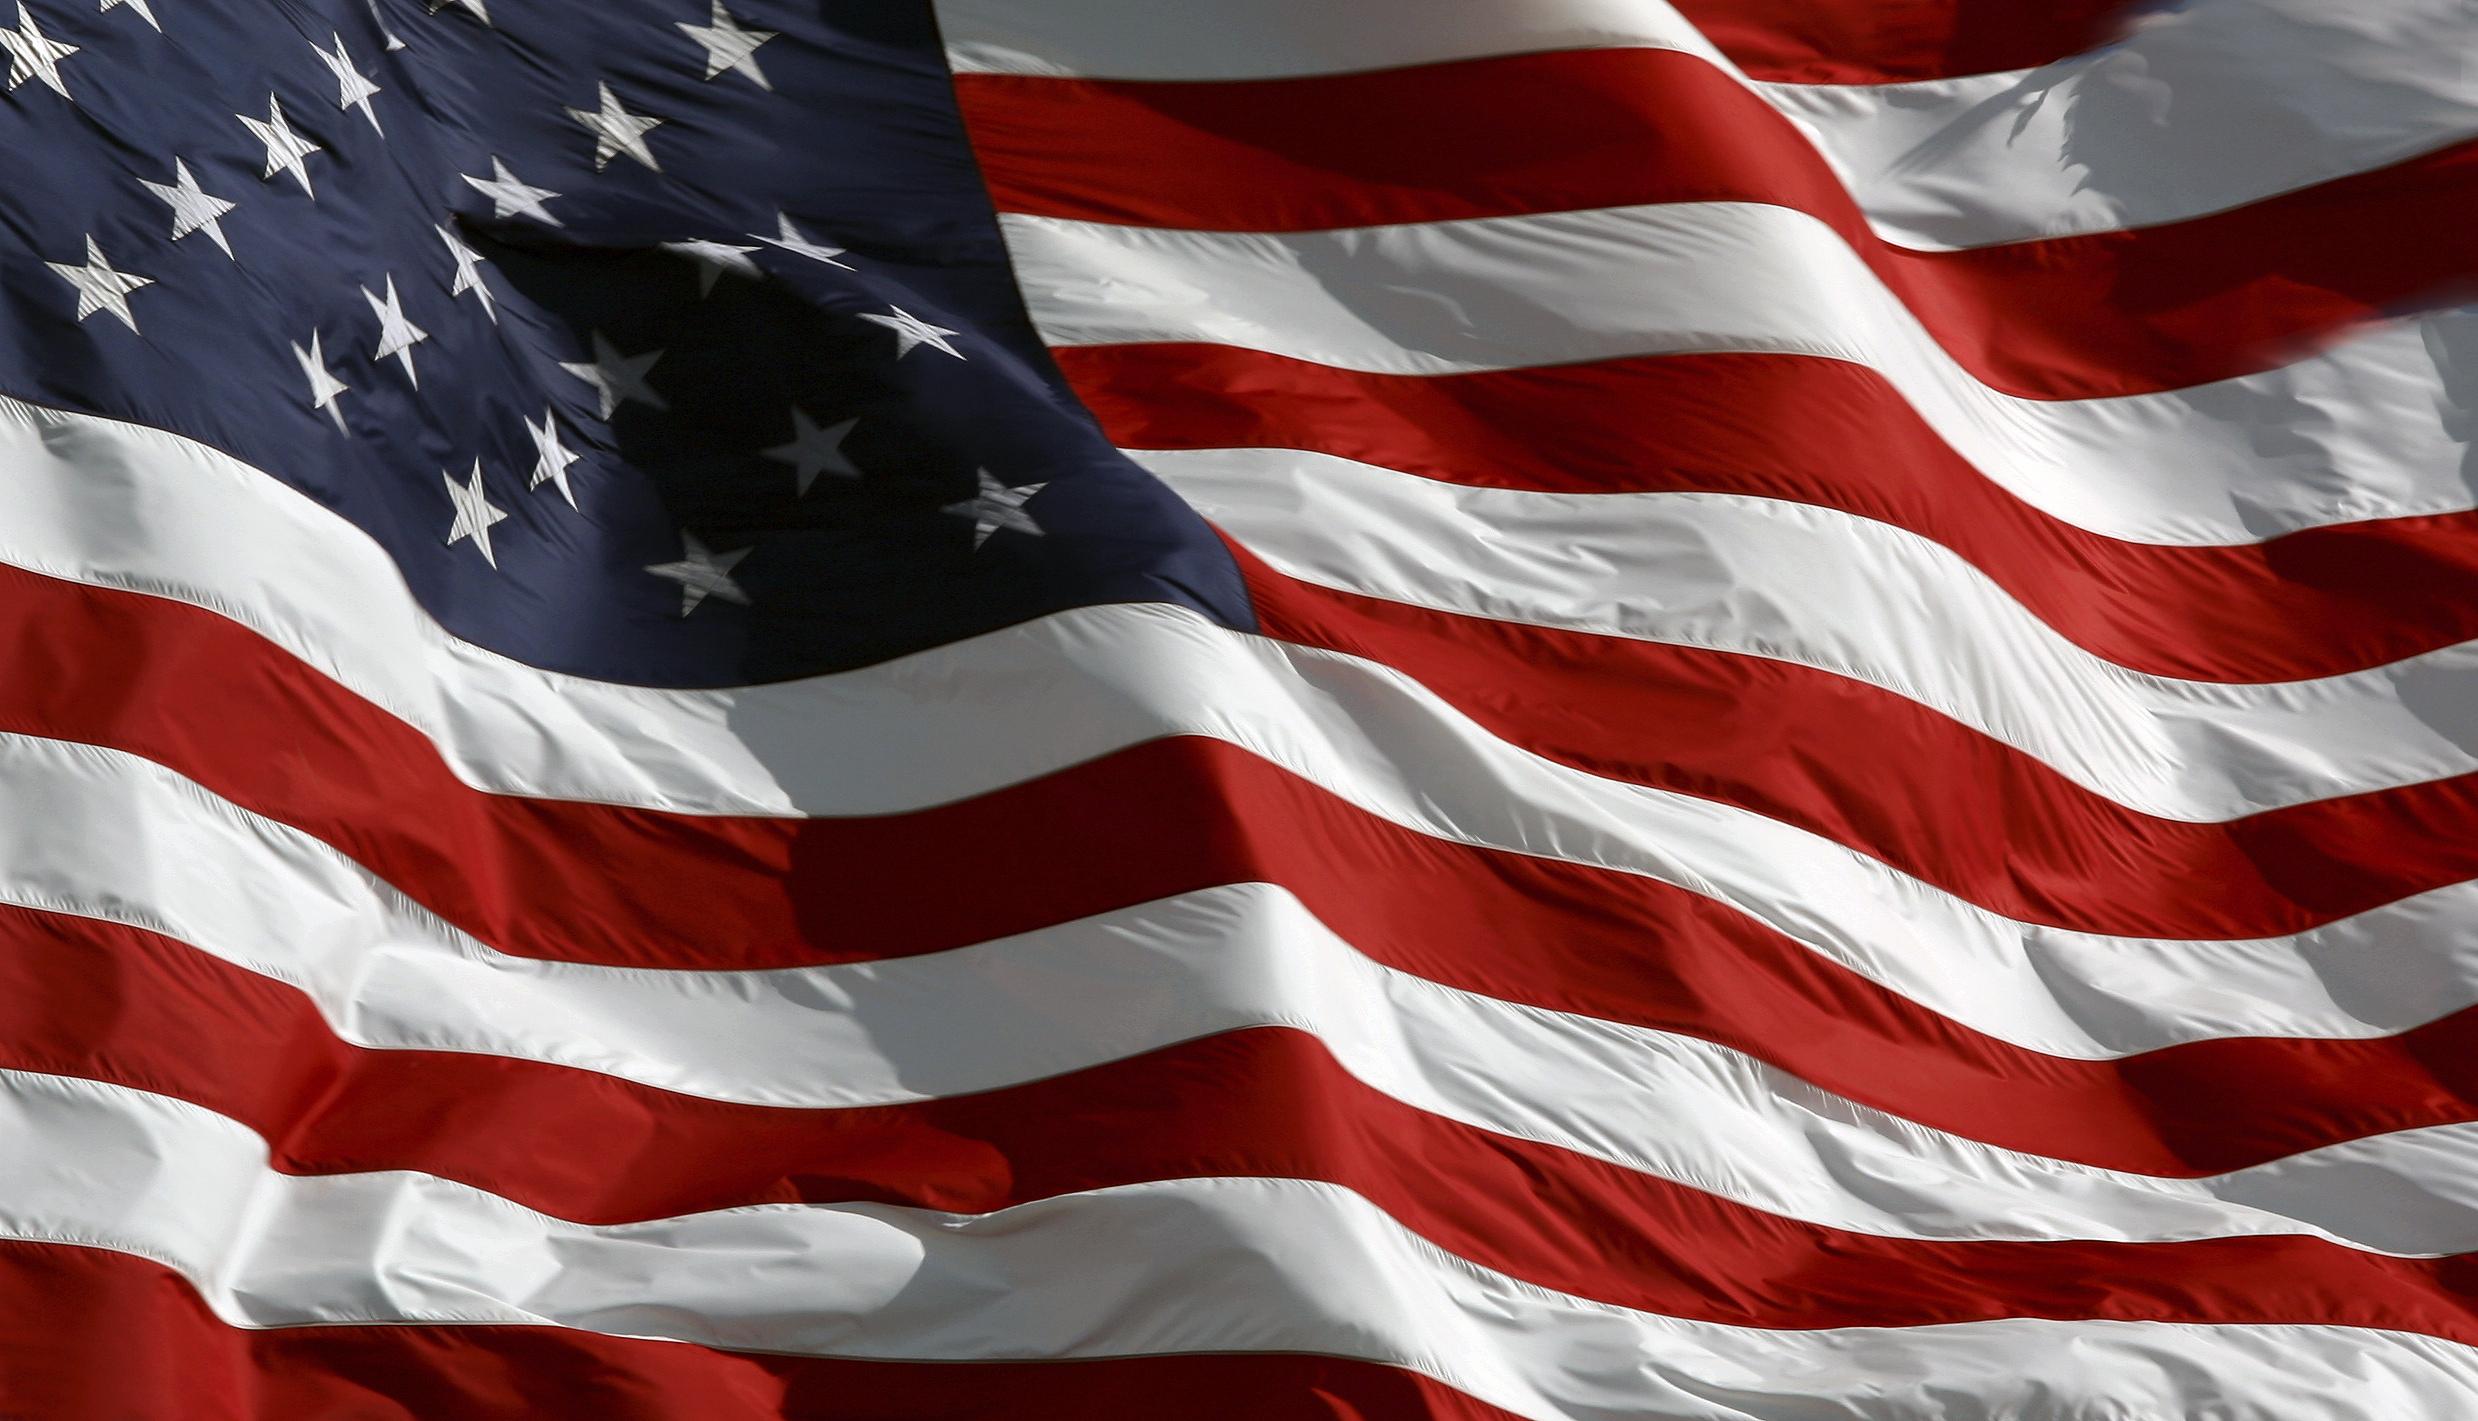 American Flag 2478x1421